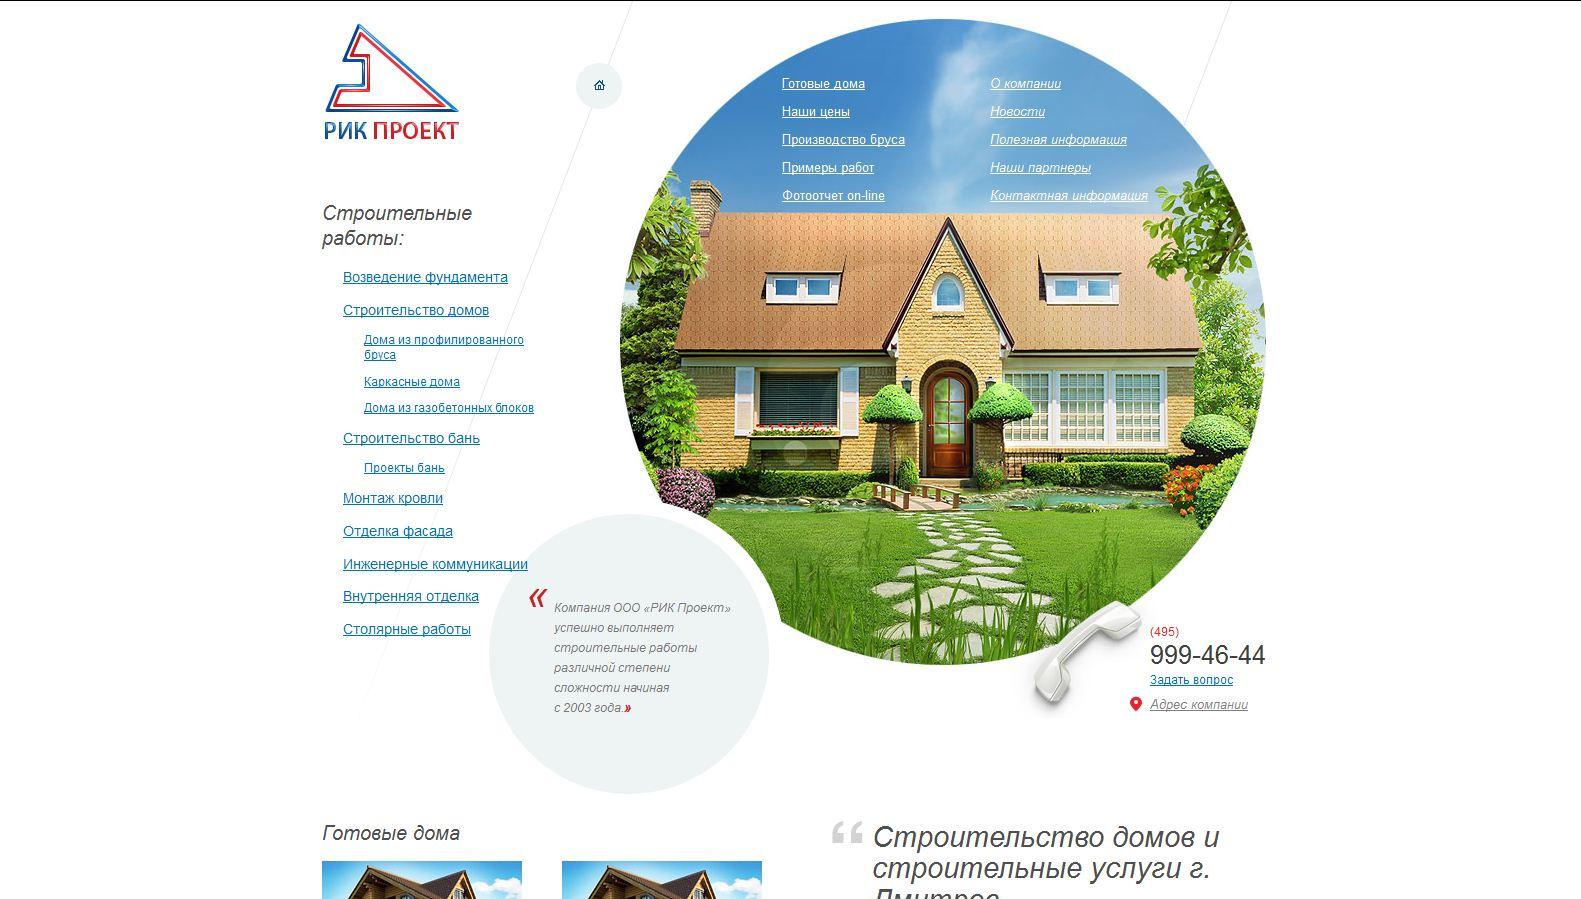 rik-proekt.ru